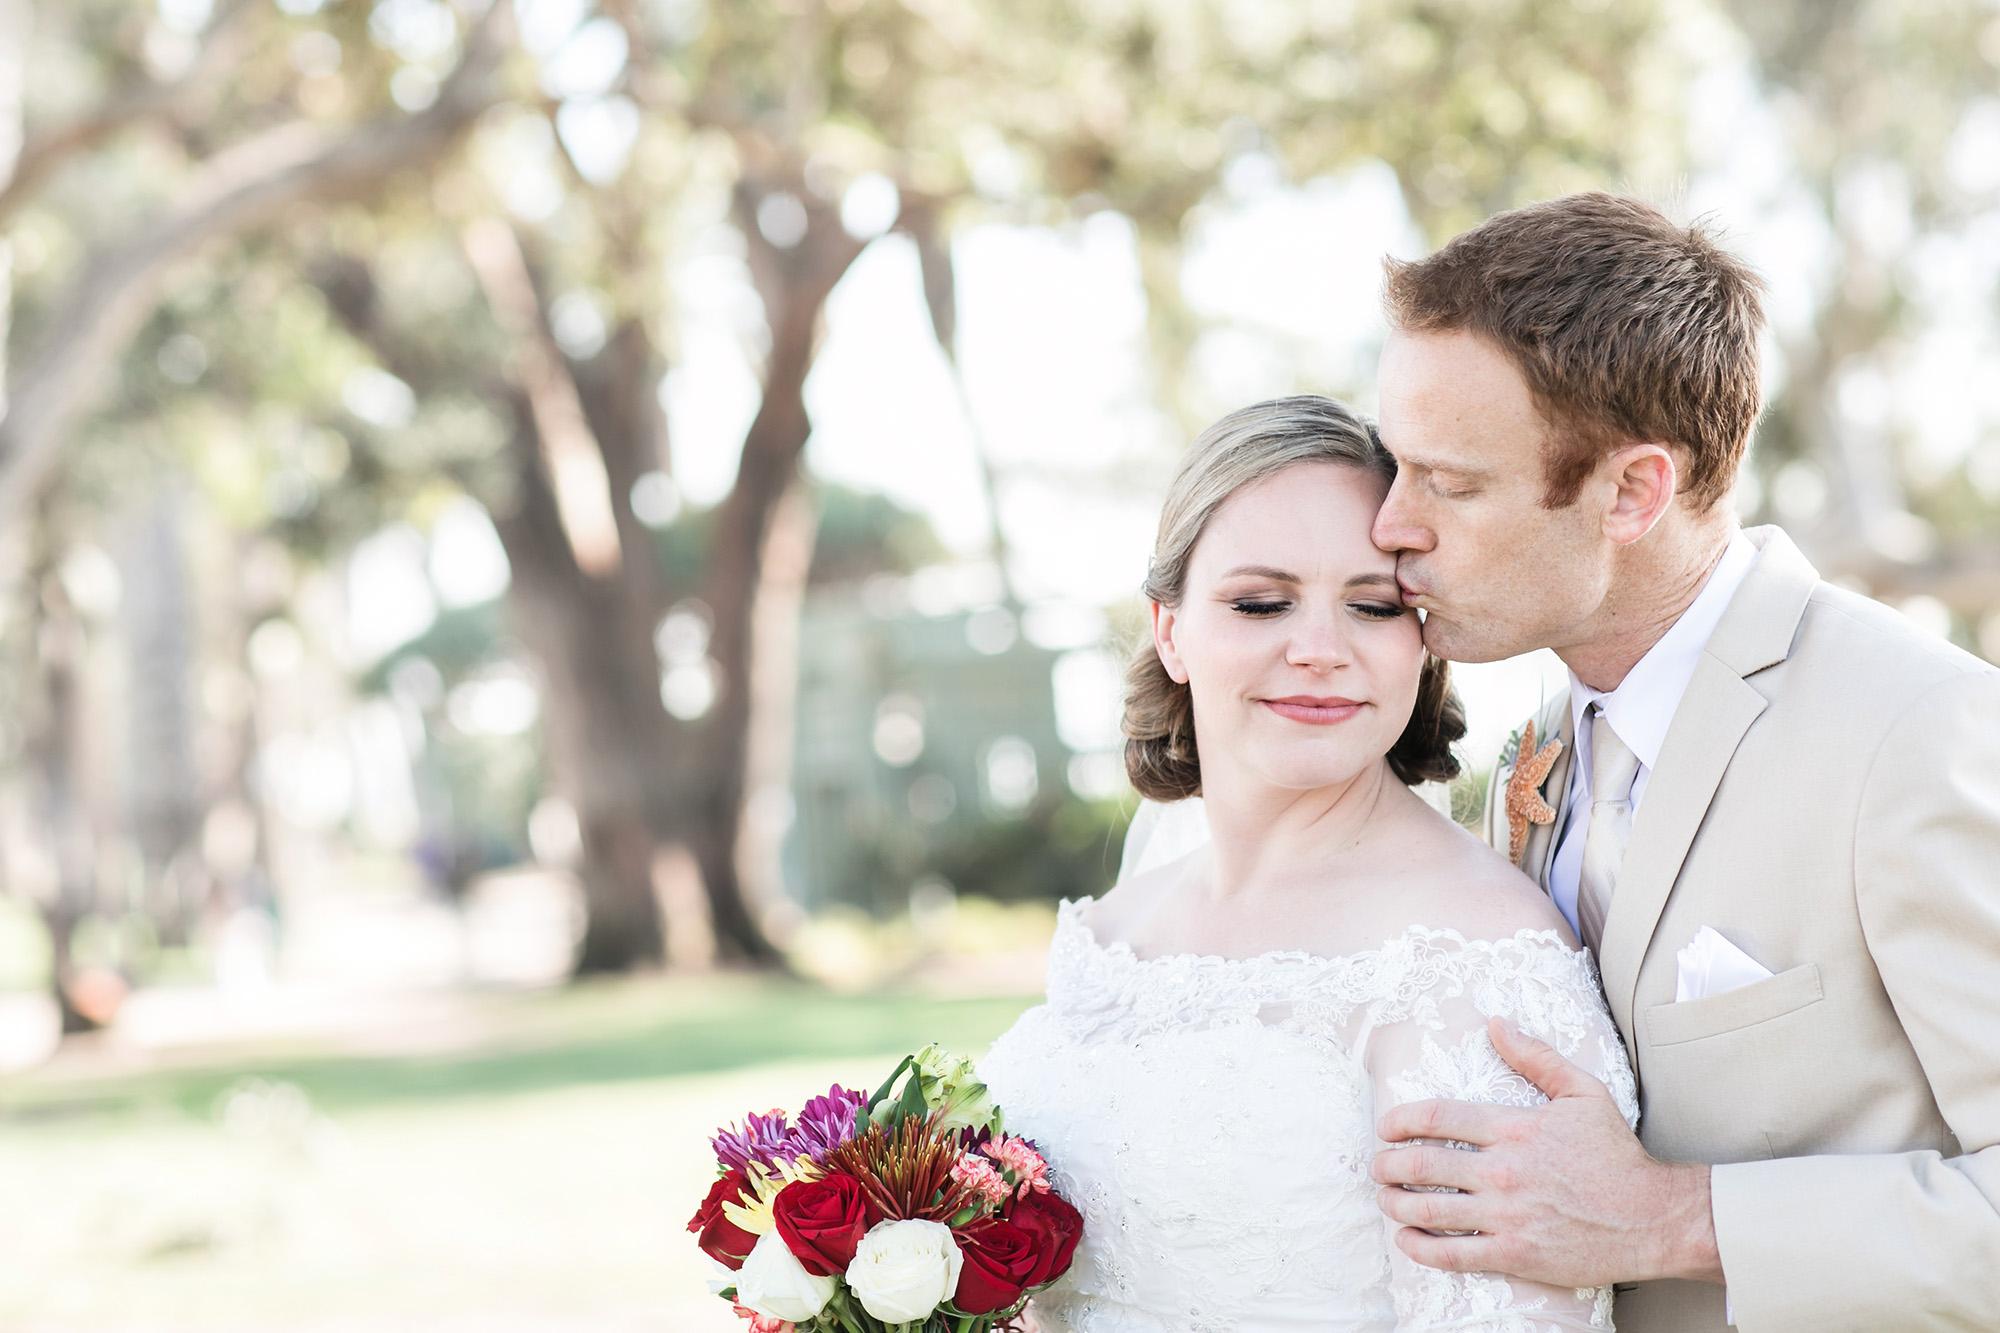 unforgettable-st-monica-wedding-carrie-vines-photography-028.jpg